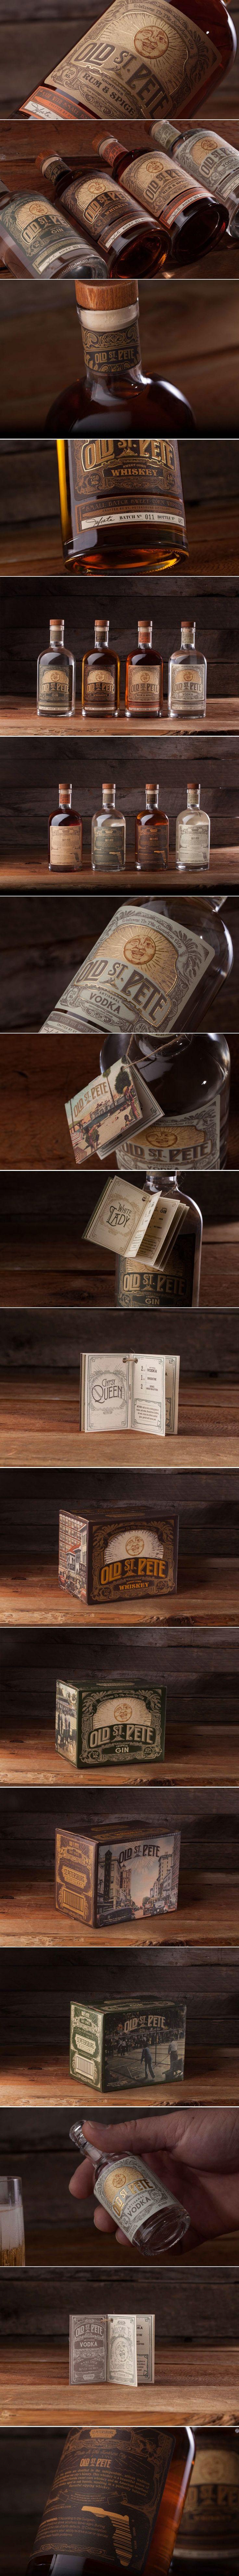 Old St. Pete Craft Spirits — The Dieline   Packaging & Branding Design & Innovation News